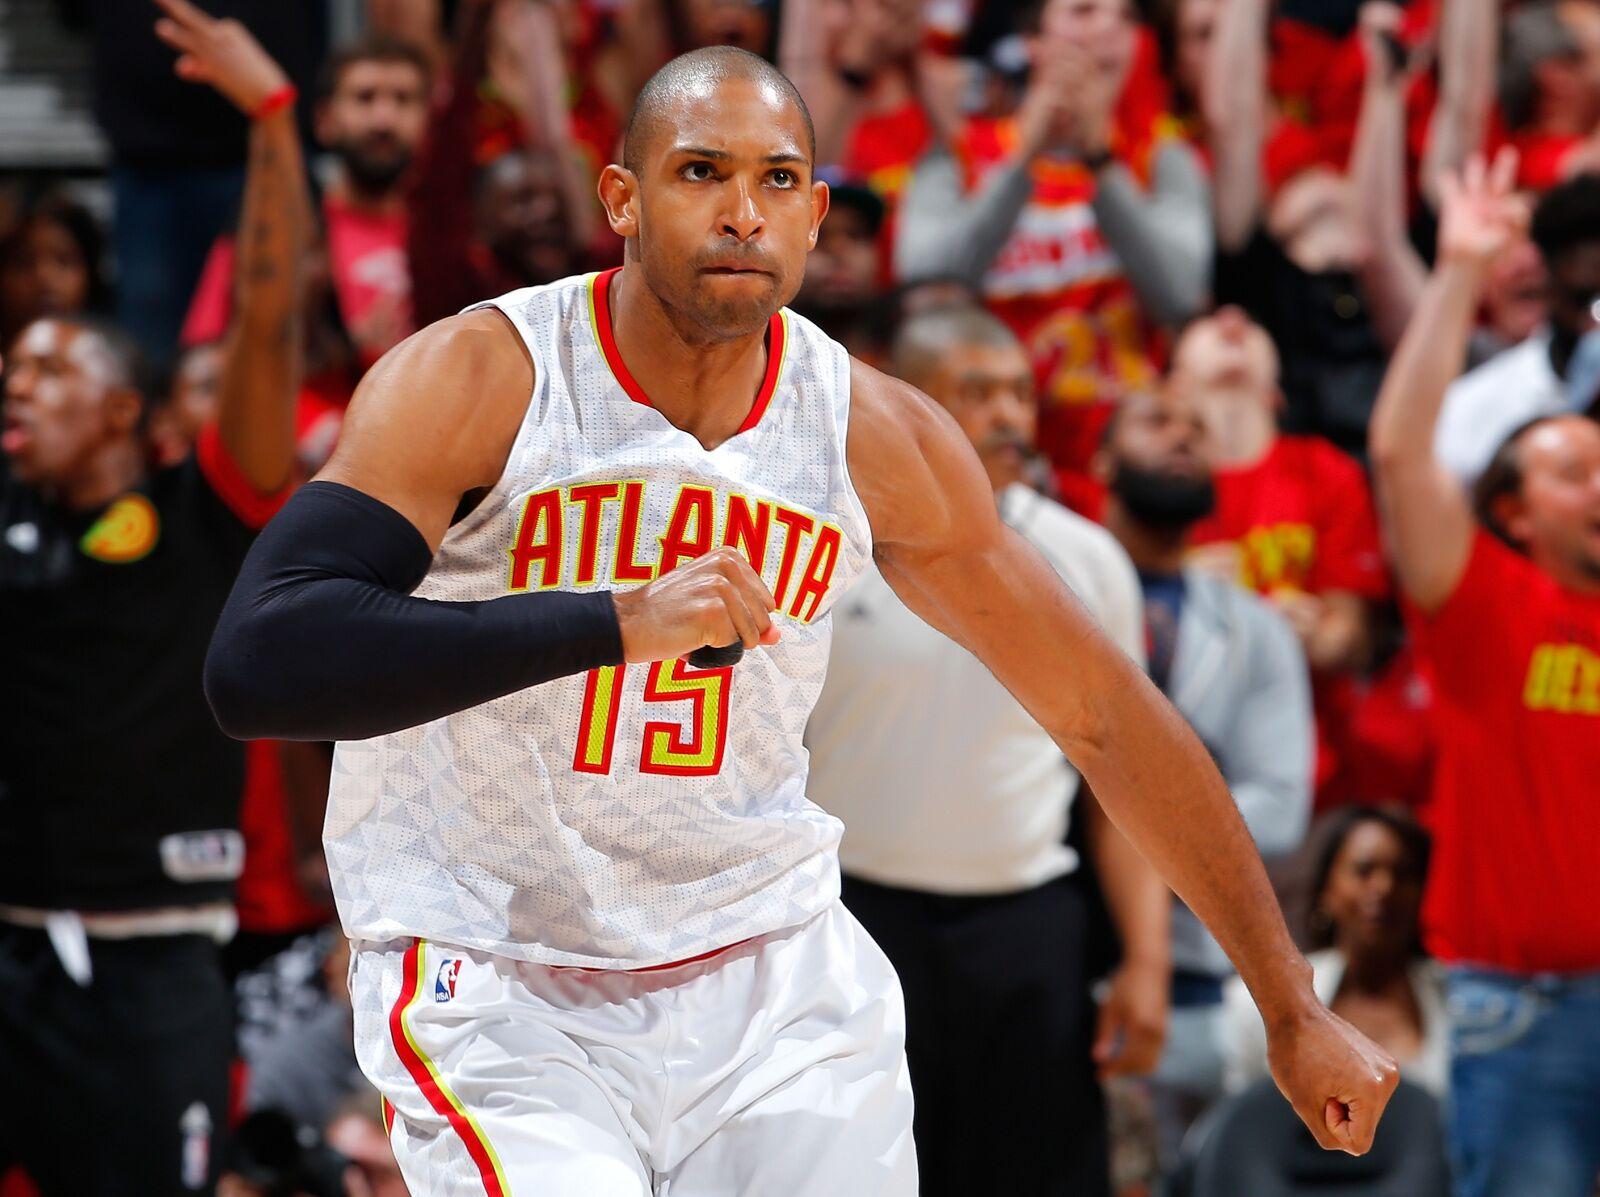 Atlanta Hawks: 15 best NBA Draft picks of all-time